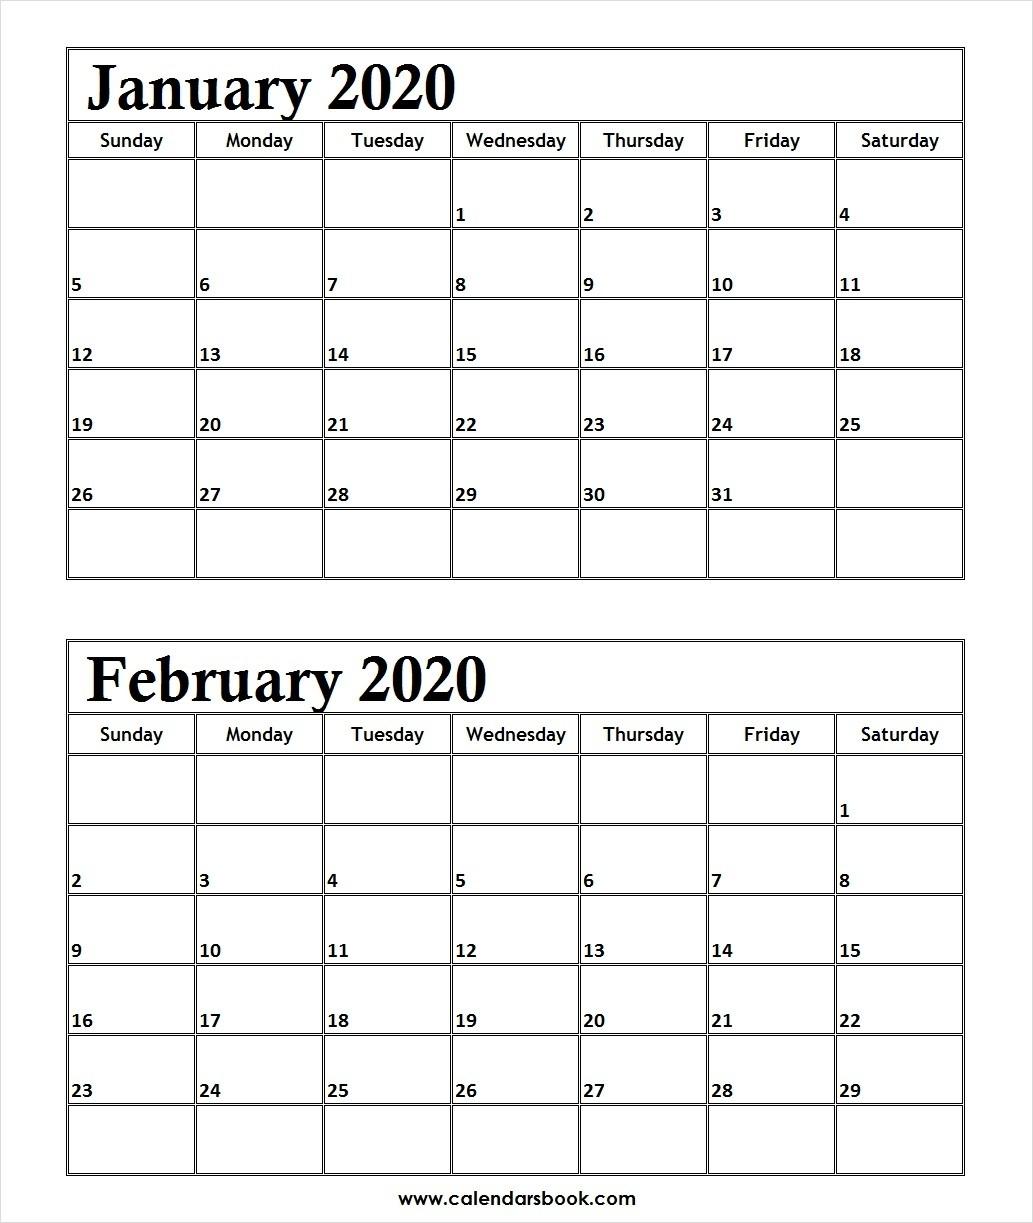 Print January February 2020 Calendar Template   2 Month Calendar-2020 January February Calendar